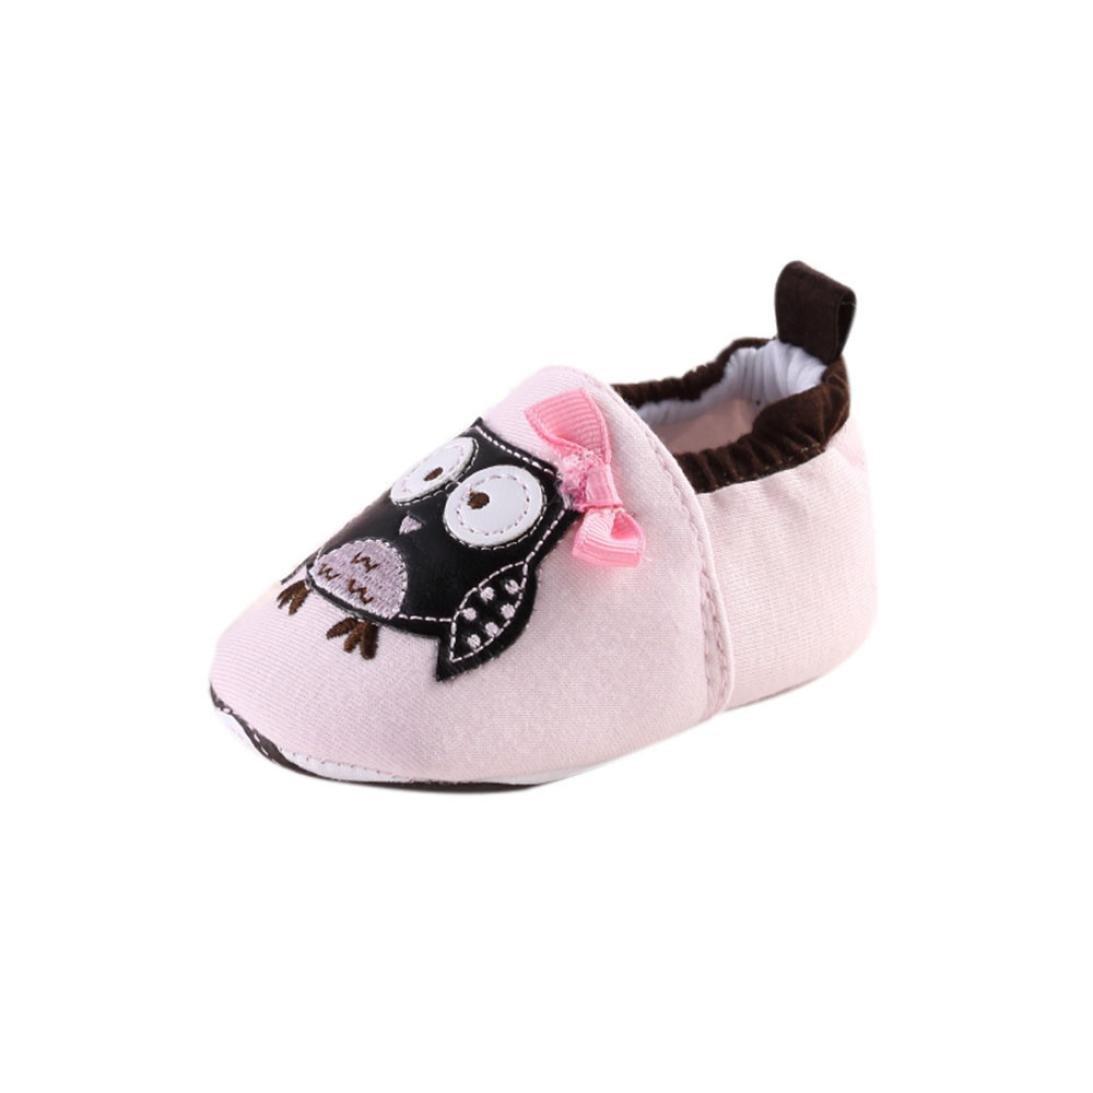 Transer Chaussures de b/éb/é Joli b/éb/é 0~18 Mois Fille Toddler Doux l/éopard Semelle Chaussures en Cuir